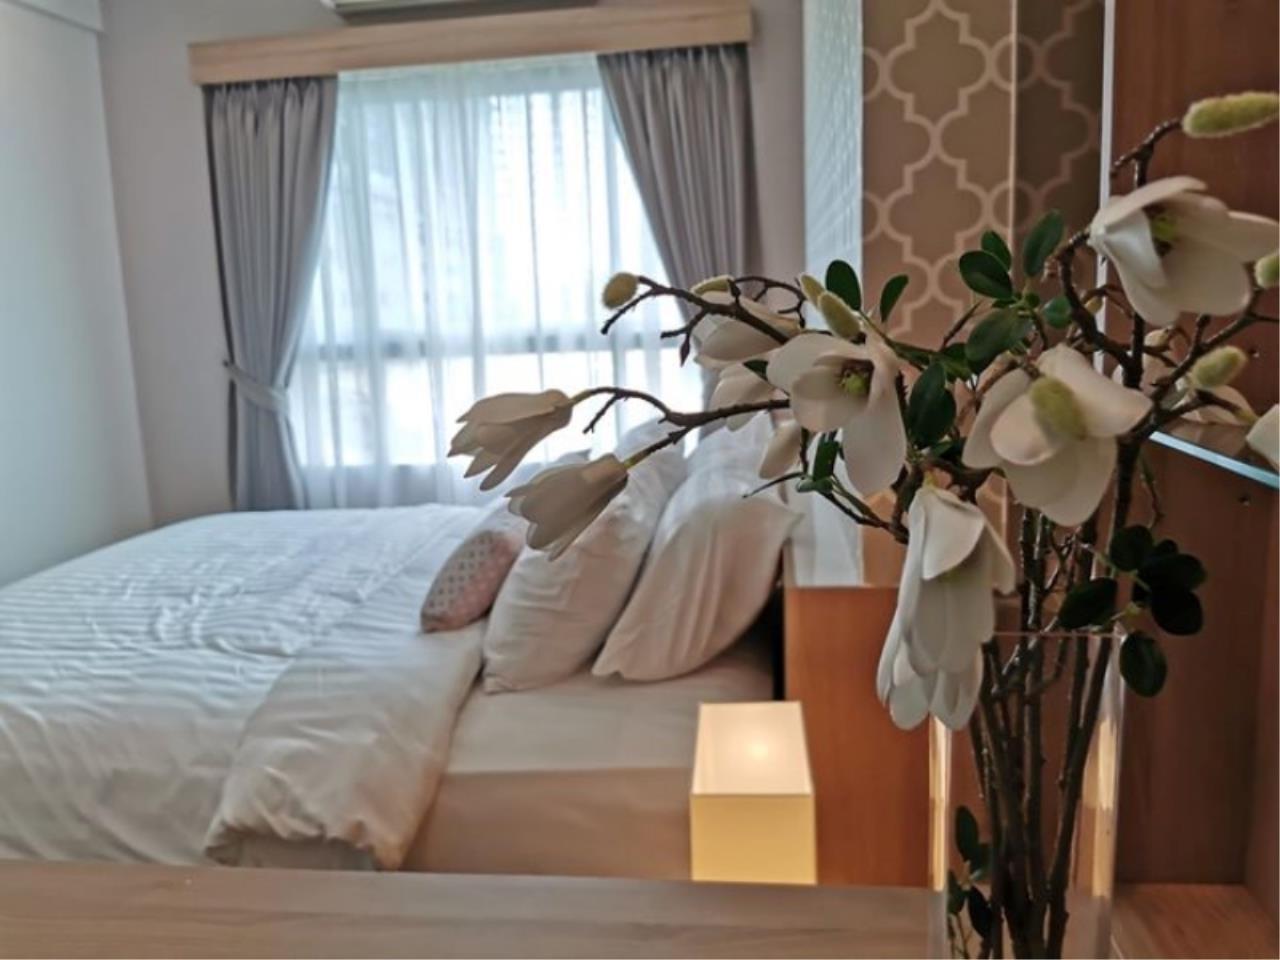 Century21 Skylux Agency's Q. House Condo Sathorn / Condo For Rent / 1 Bedroom / 47.2 SQM / BTS Krung Thon Buri / Bangkok 6